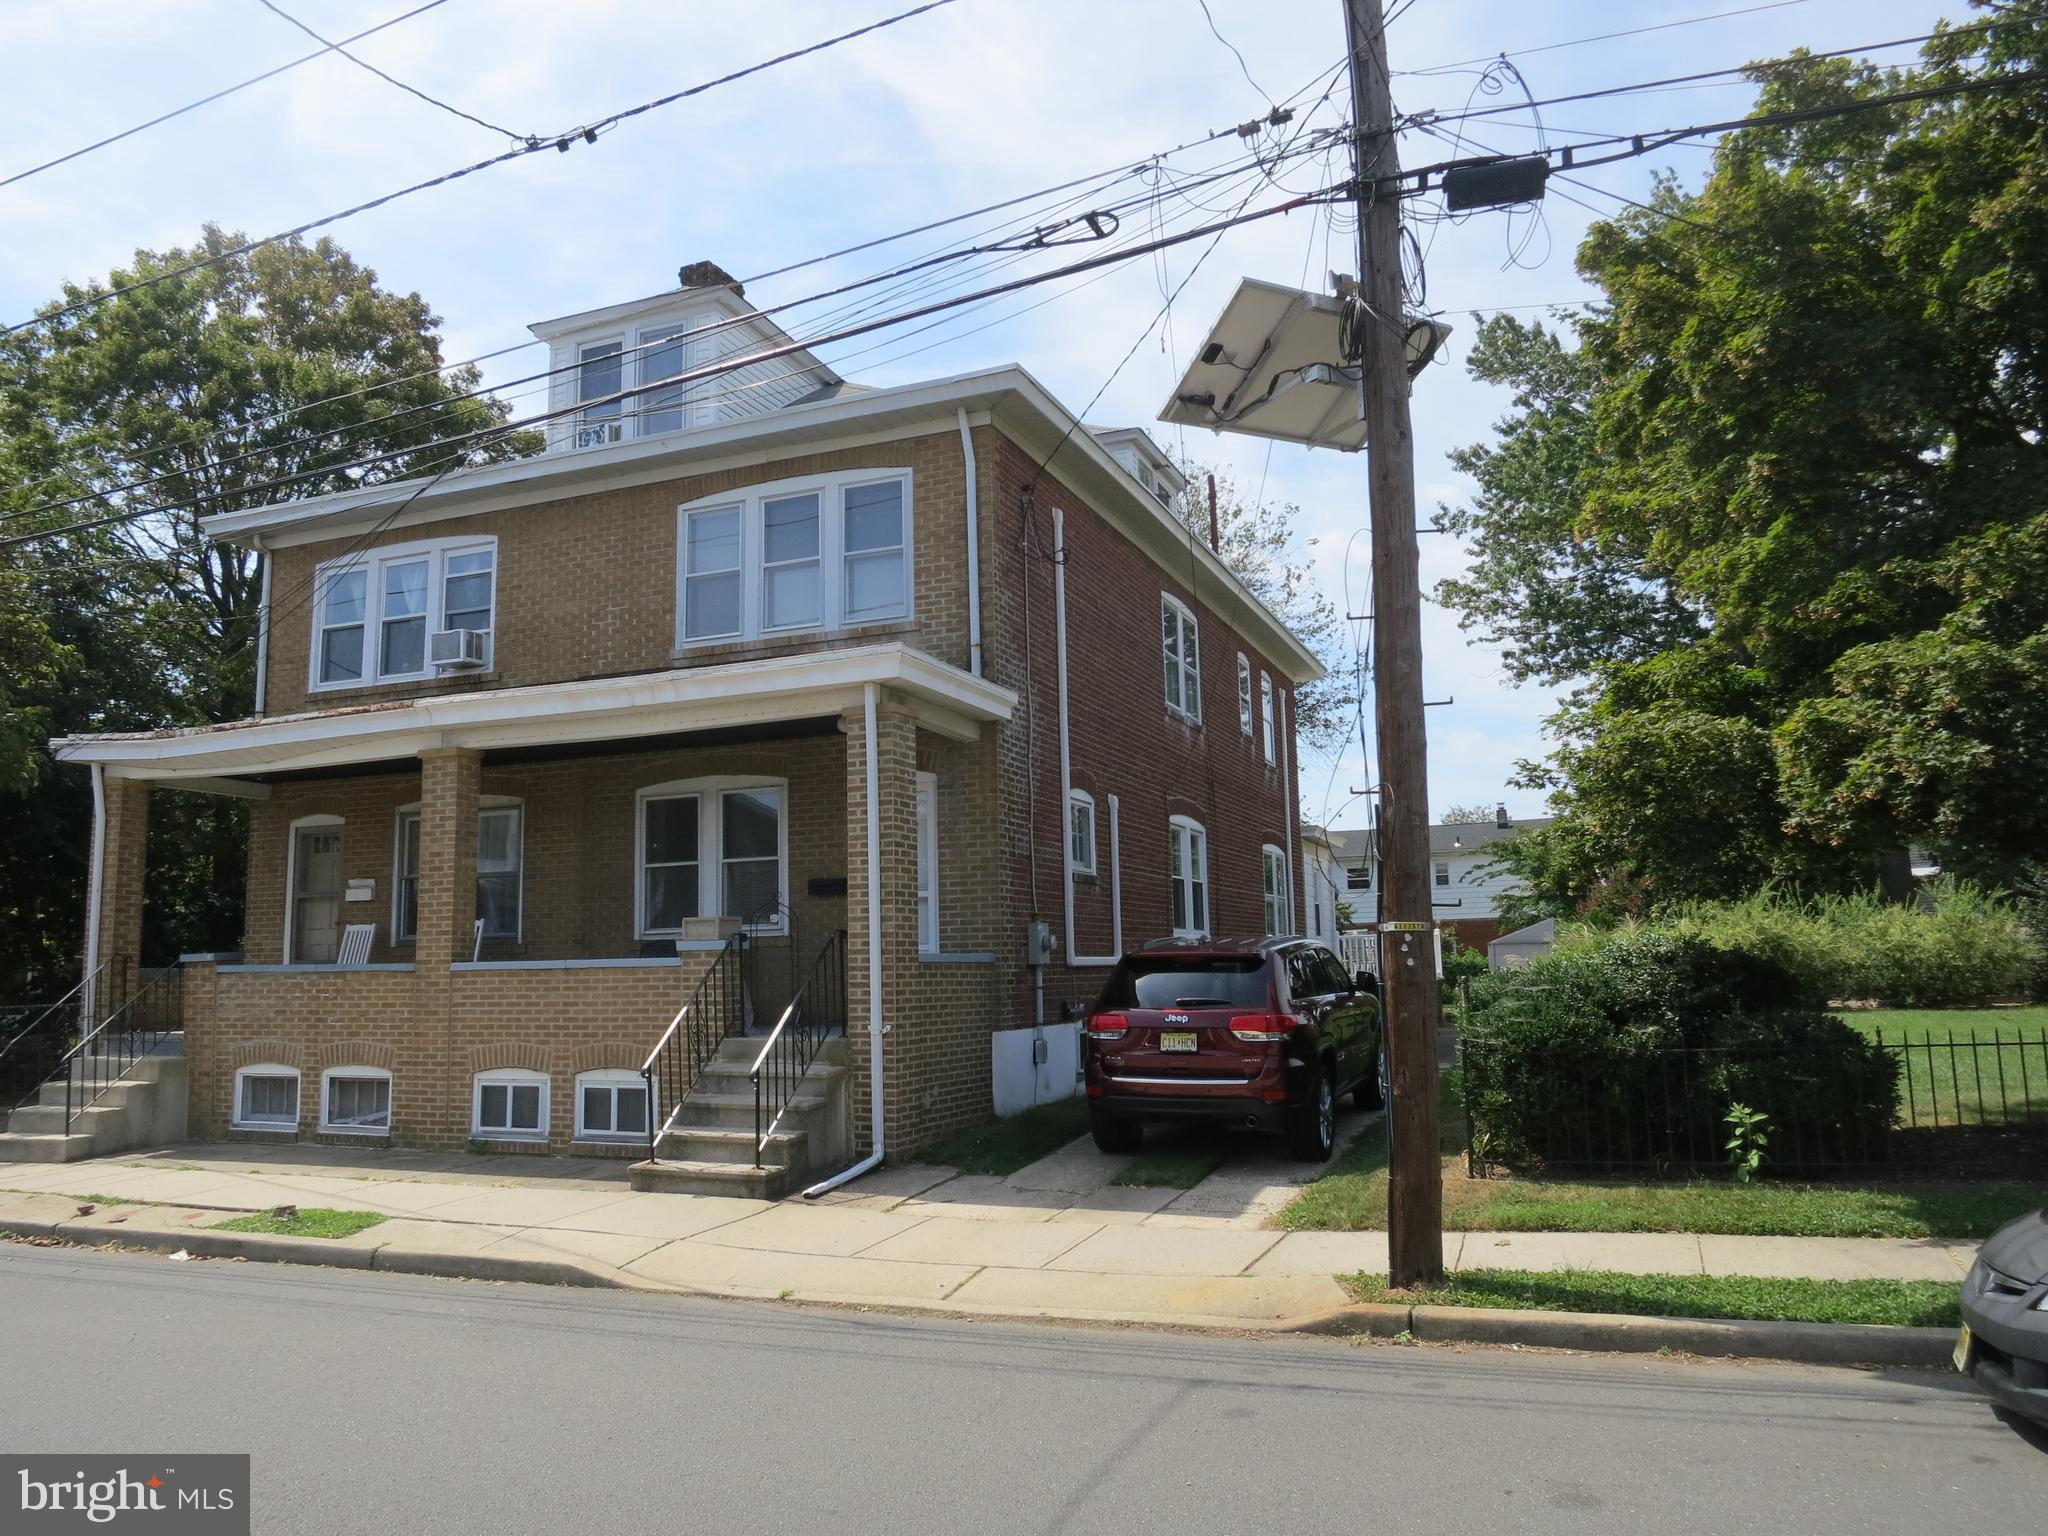 427 BERT AVENUE, TRENTON, NJ 08629